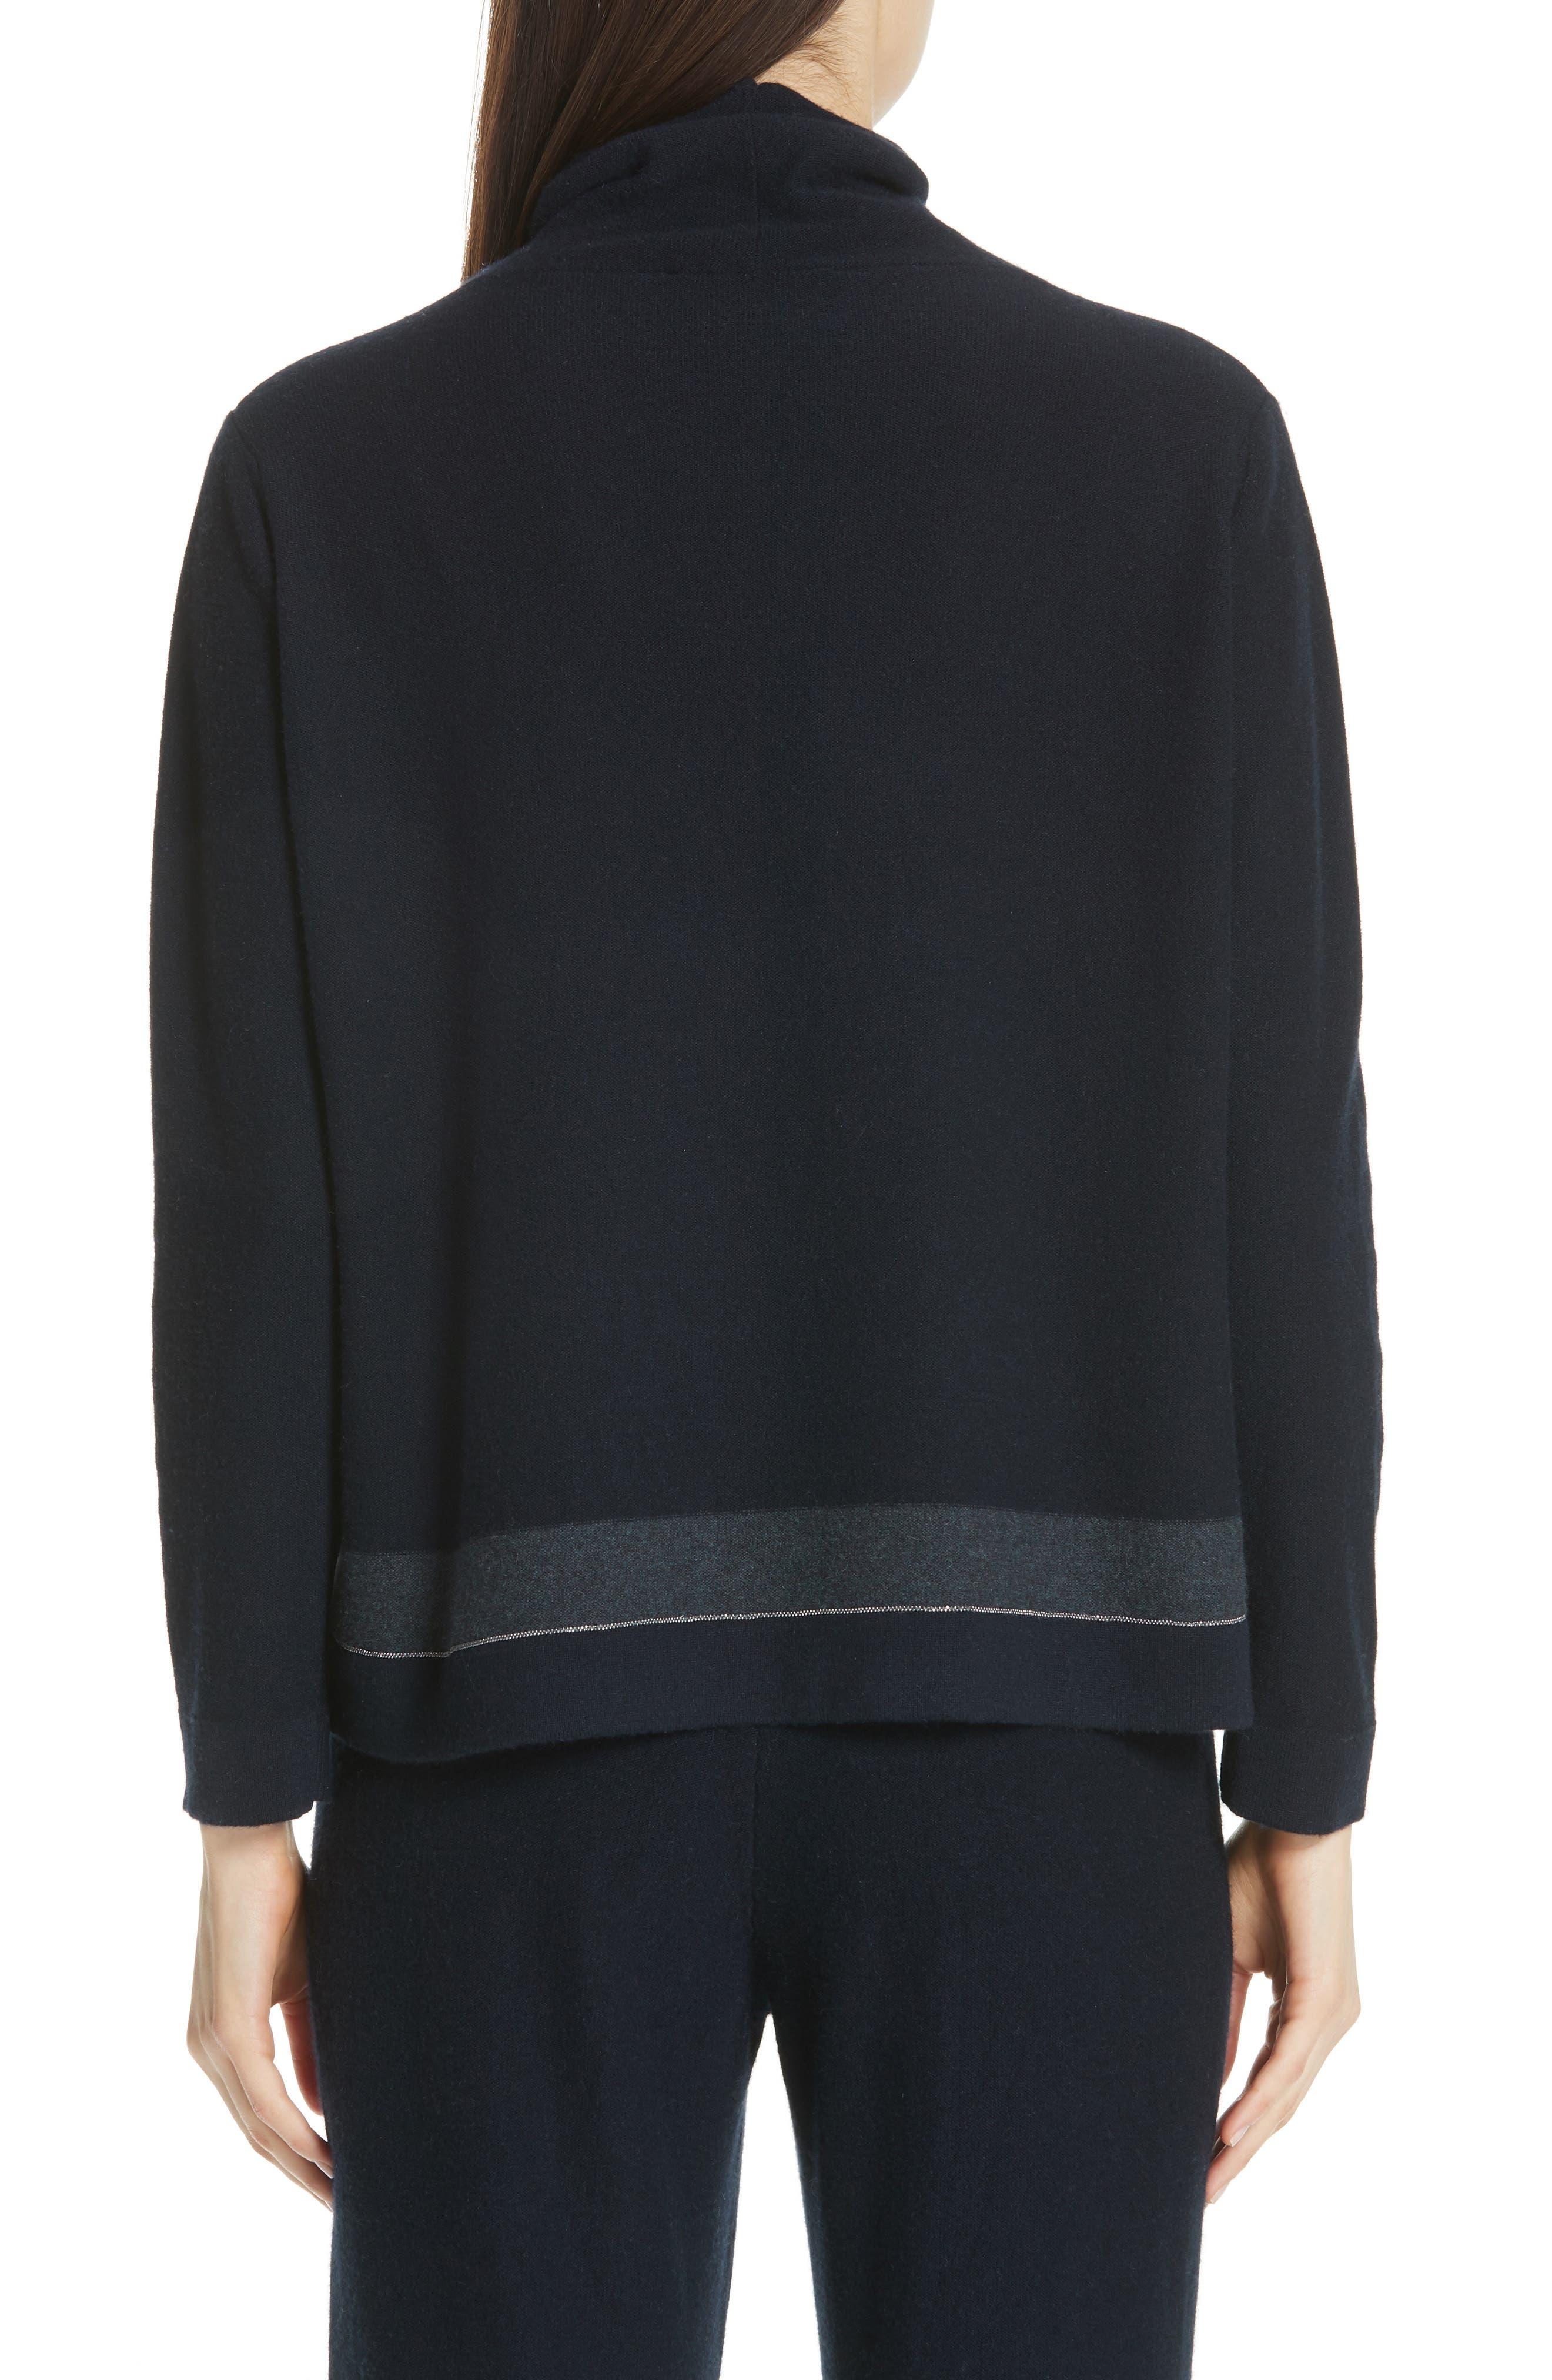 Bead Detail Cashmere Turtleneck Sweater,                             Alternate thumbnail 2, color,                             NIGHT BLUE